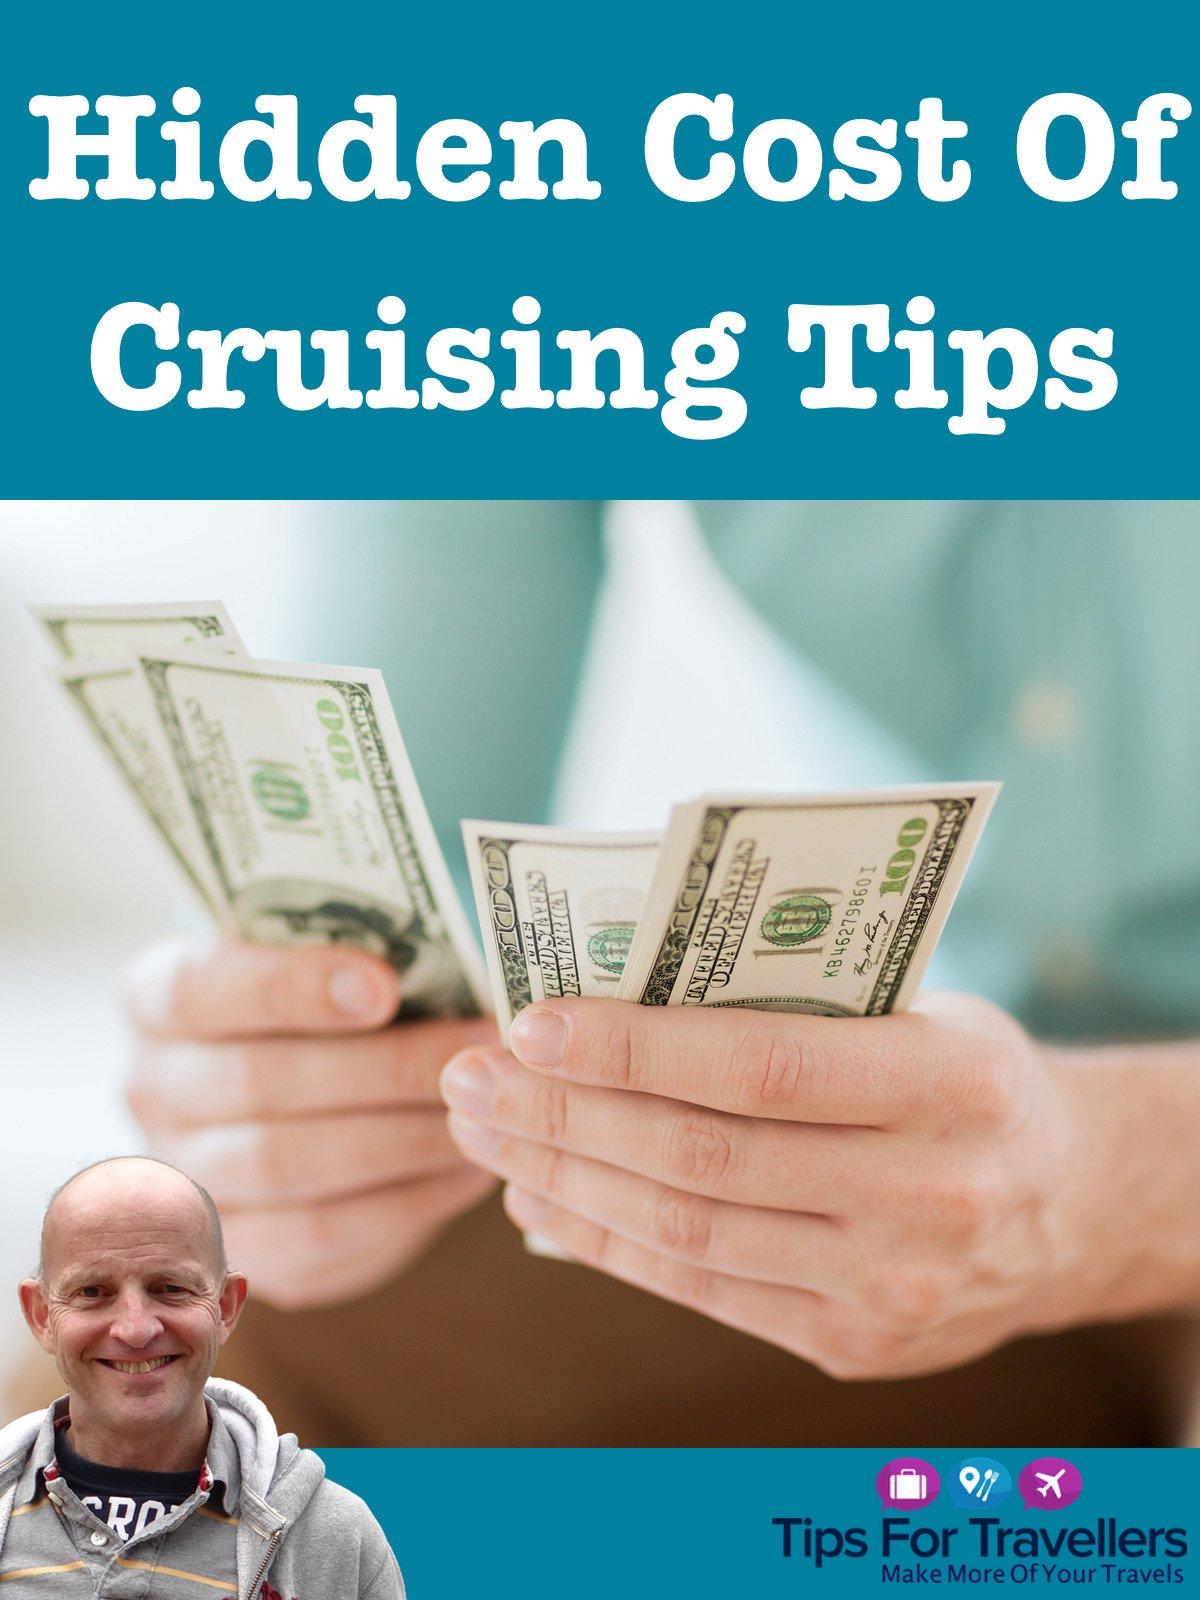 Clip: Hidden Cost Of Cruising Tips